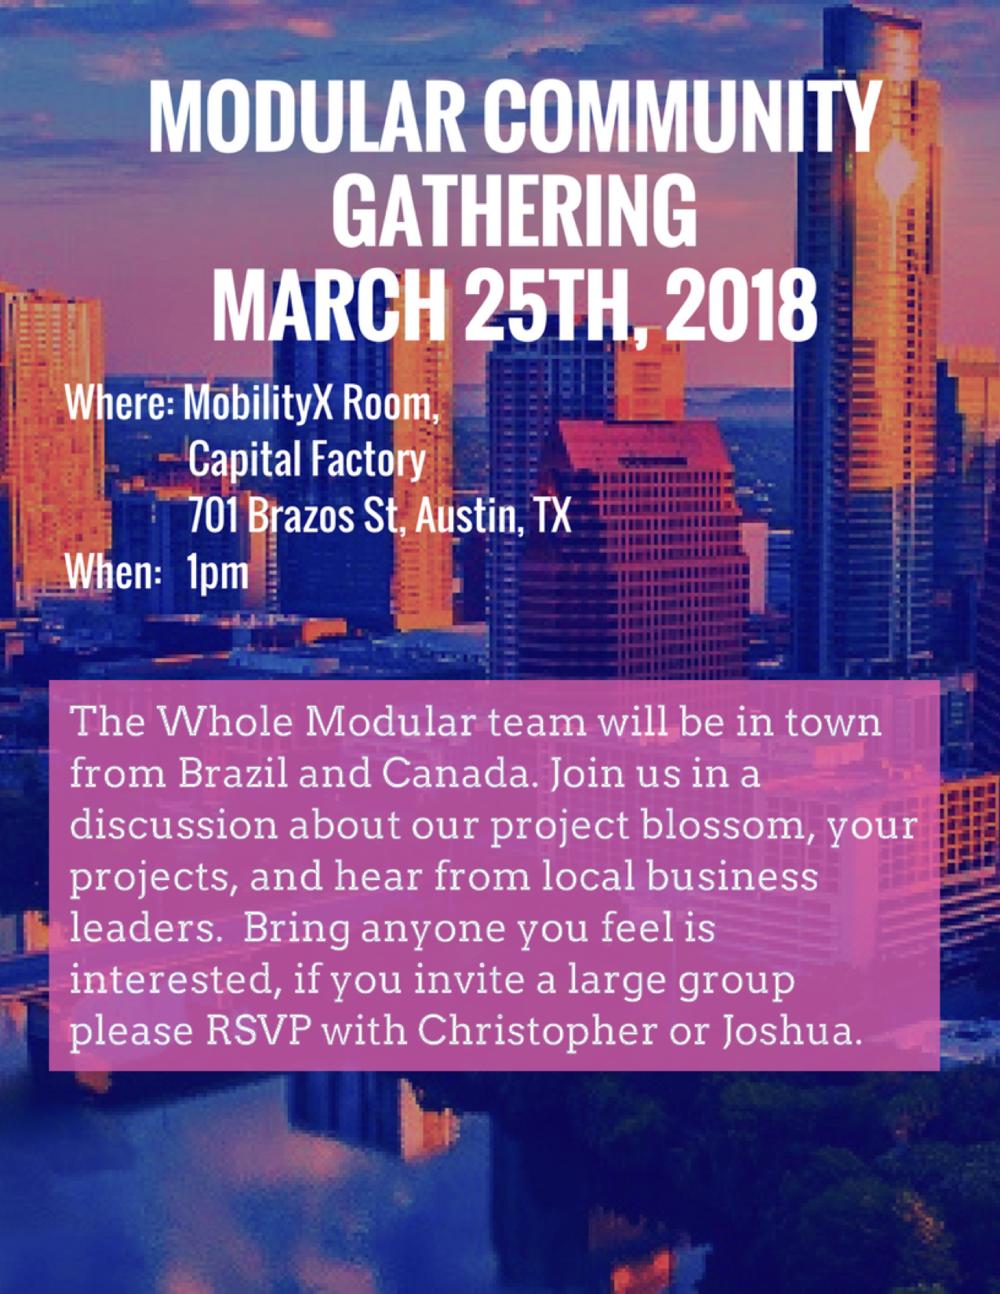 Modular community gathering.png